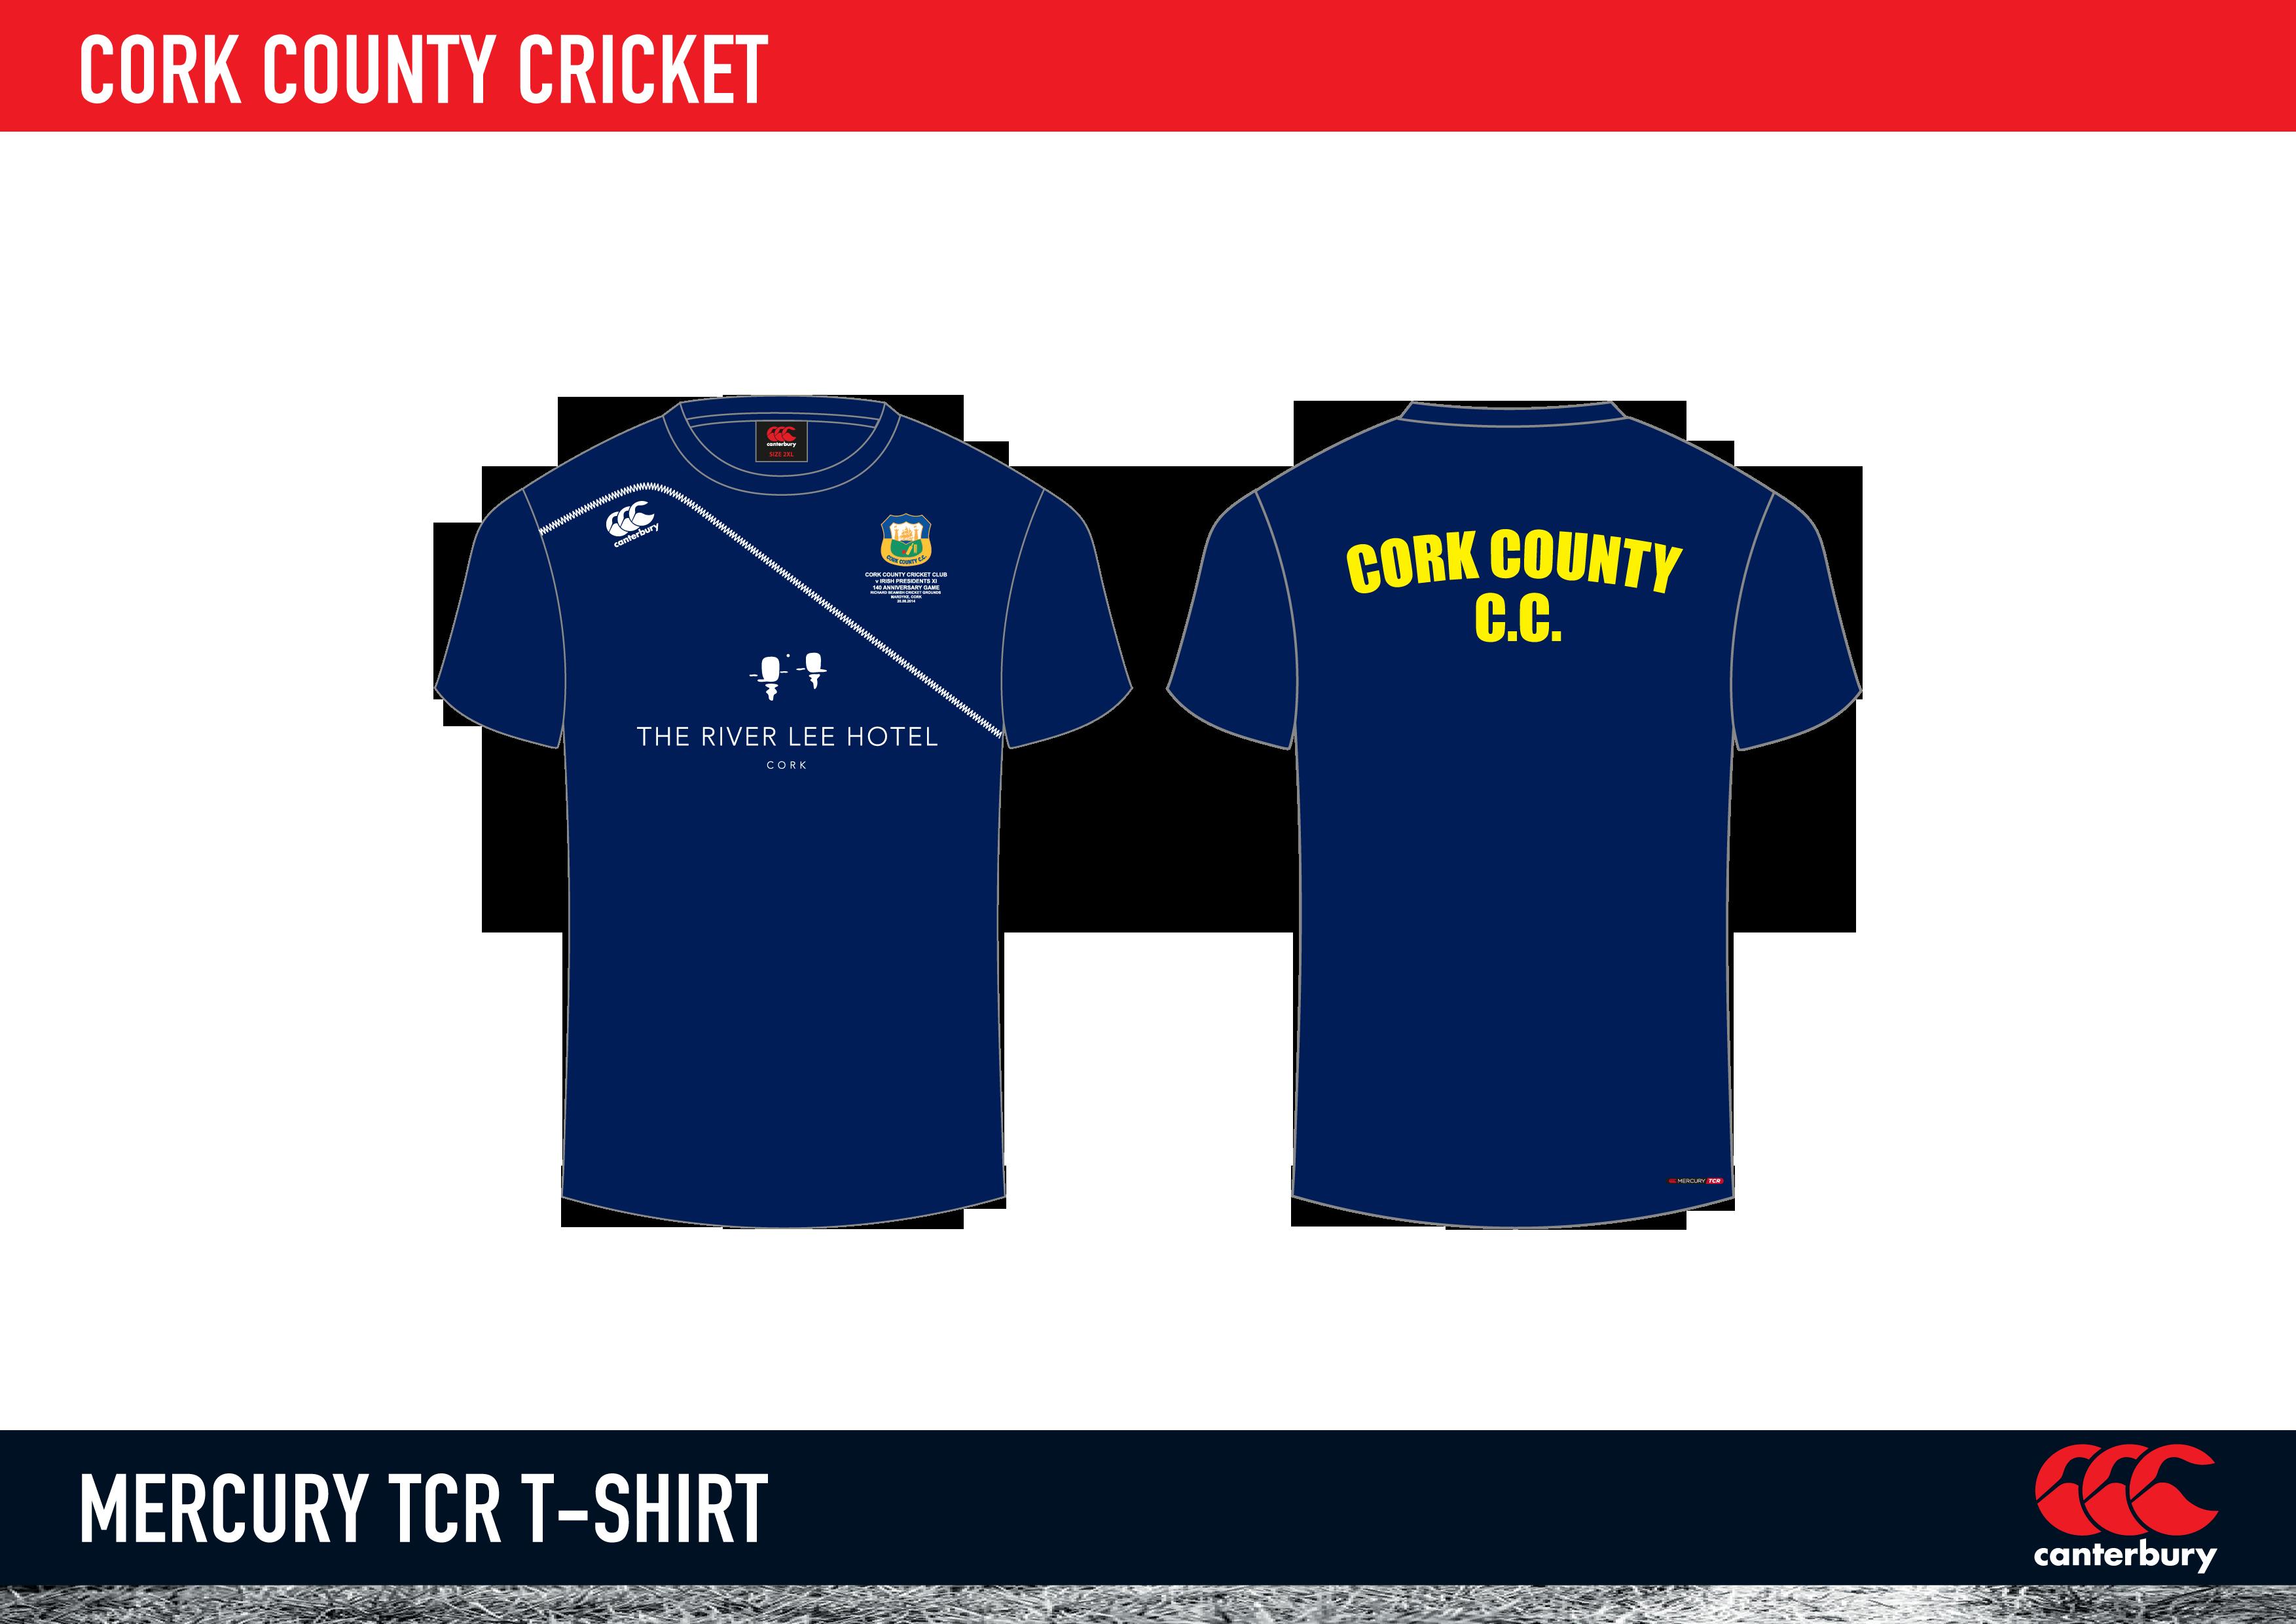 cork county cricket mercury tcr t shirt 2015 « cork county cricket